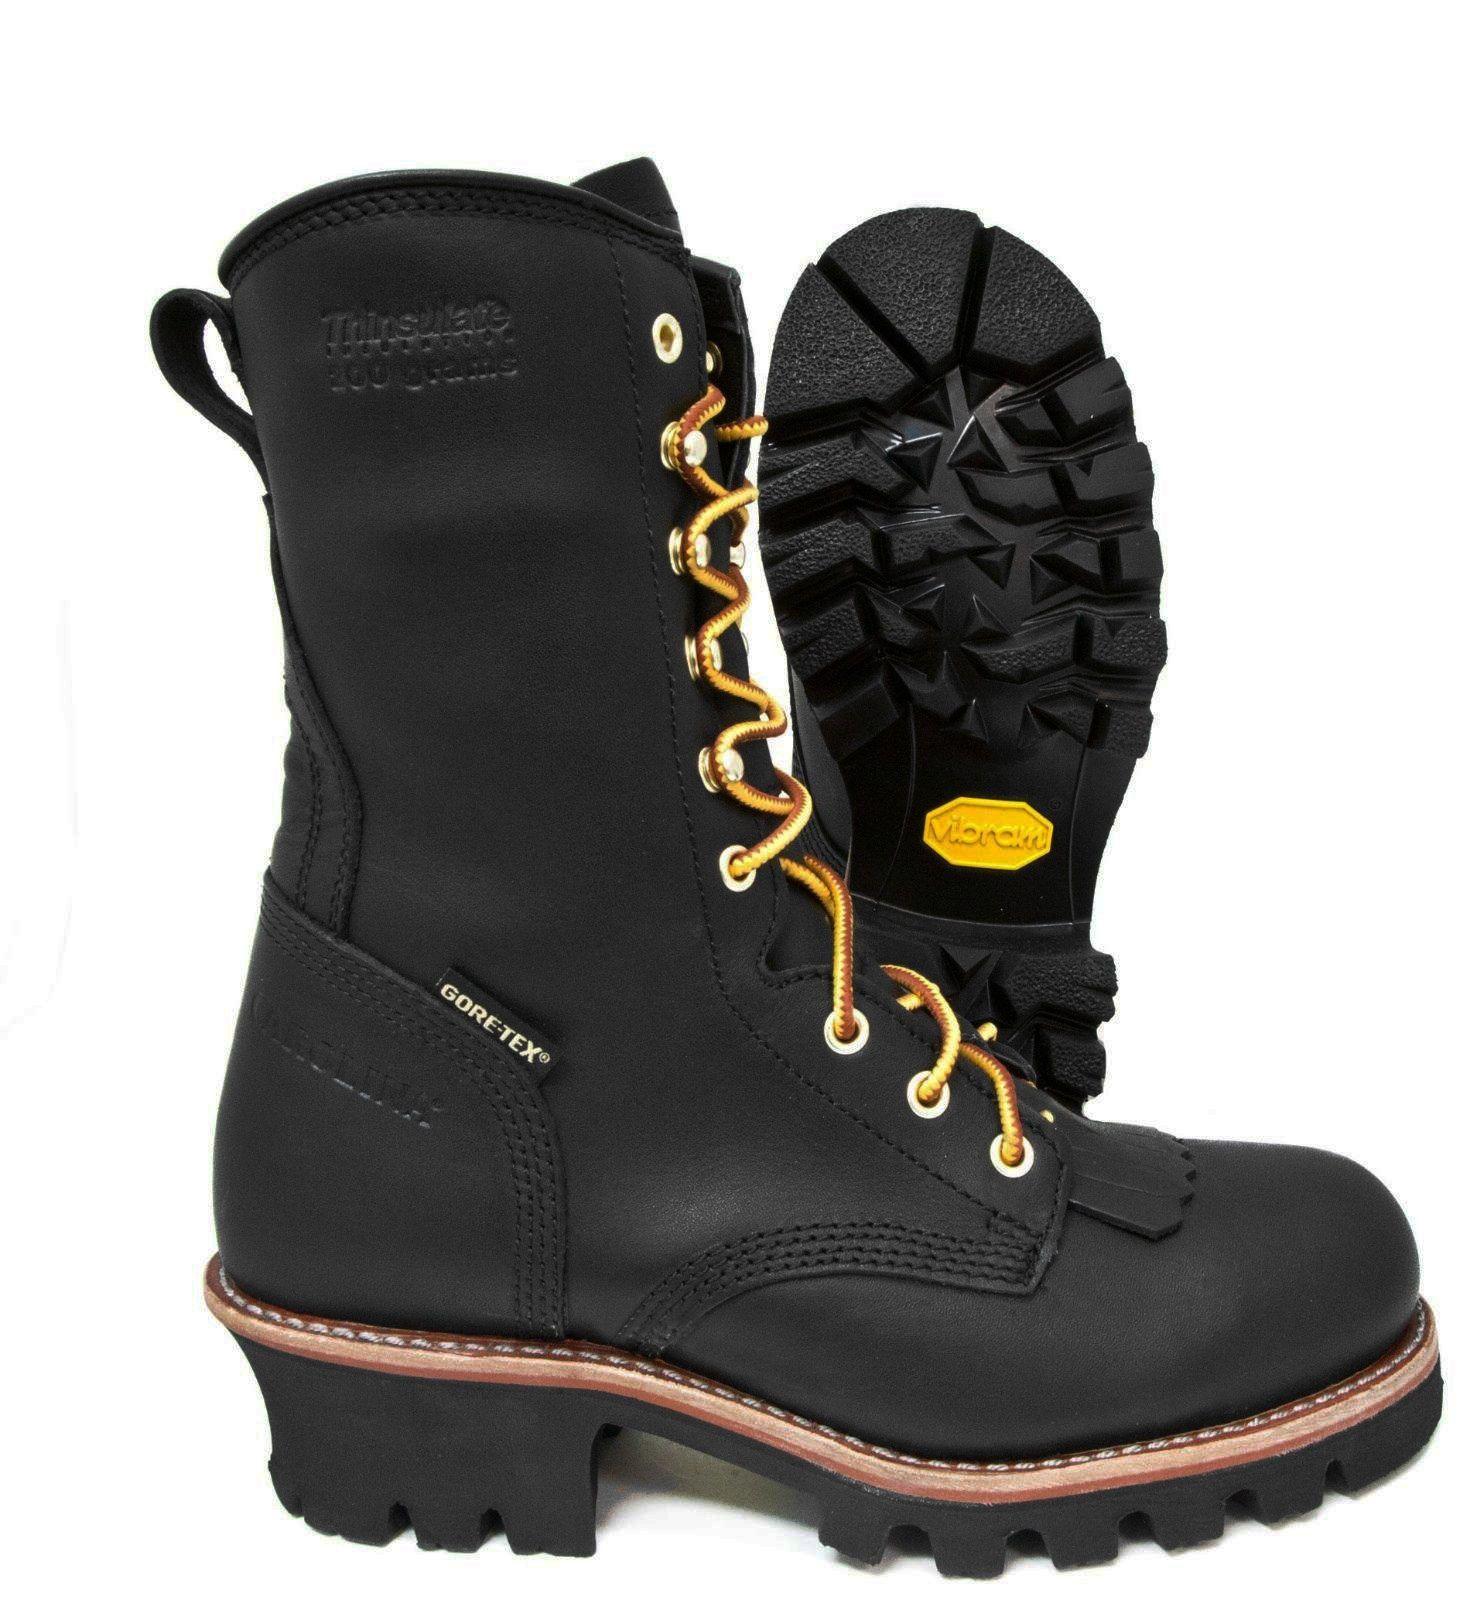 carolina logger boots for sale